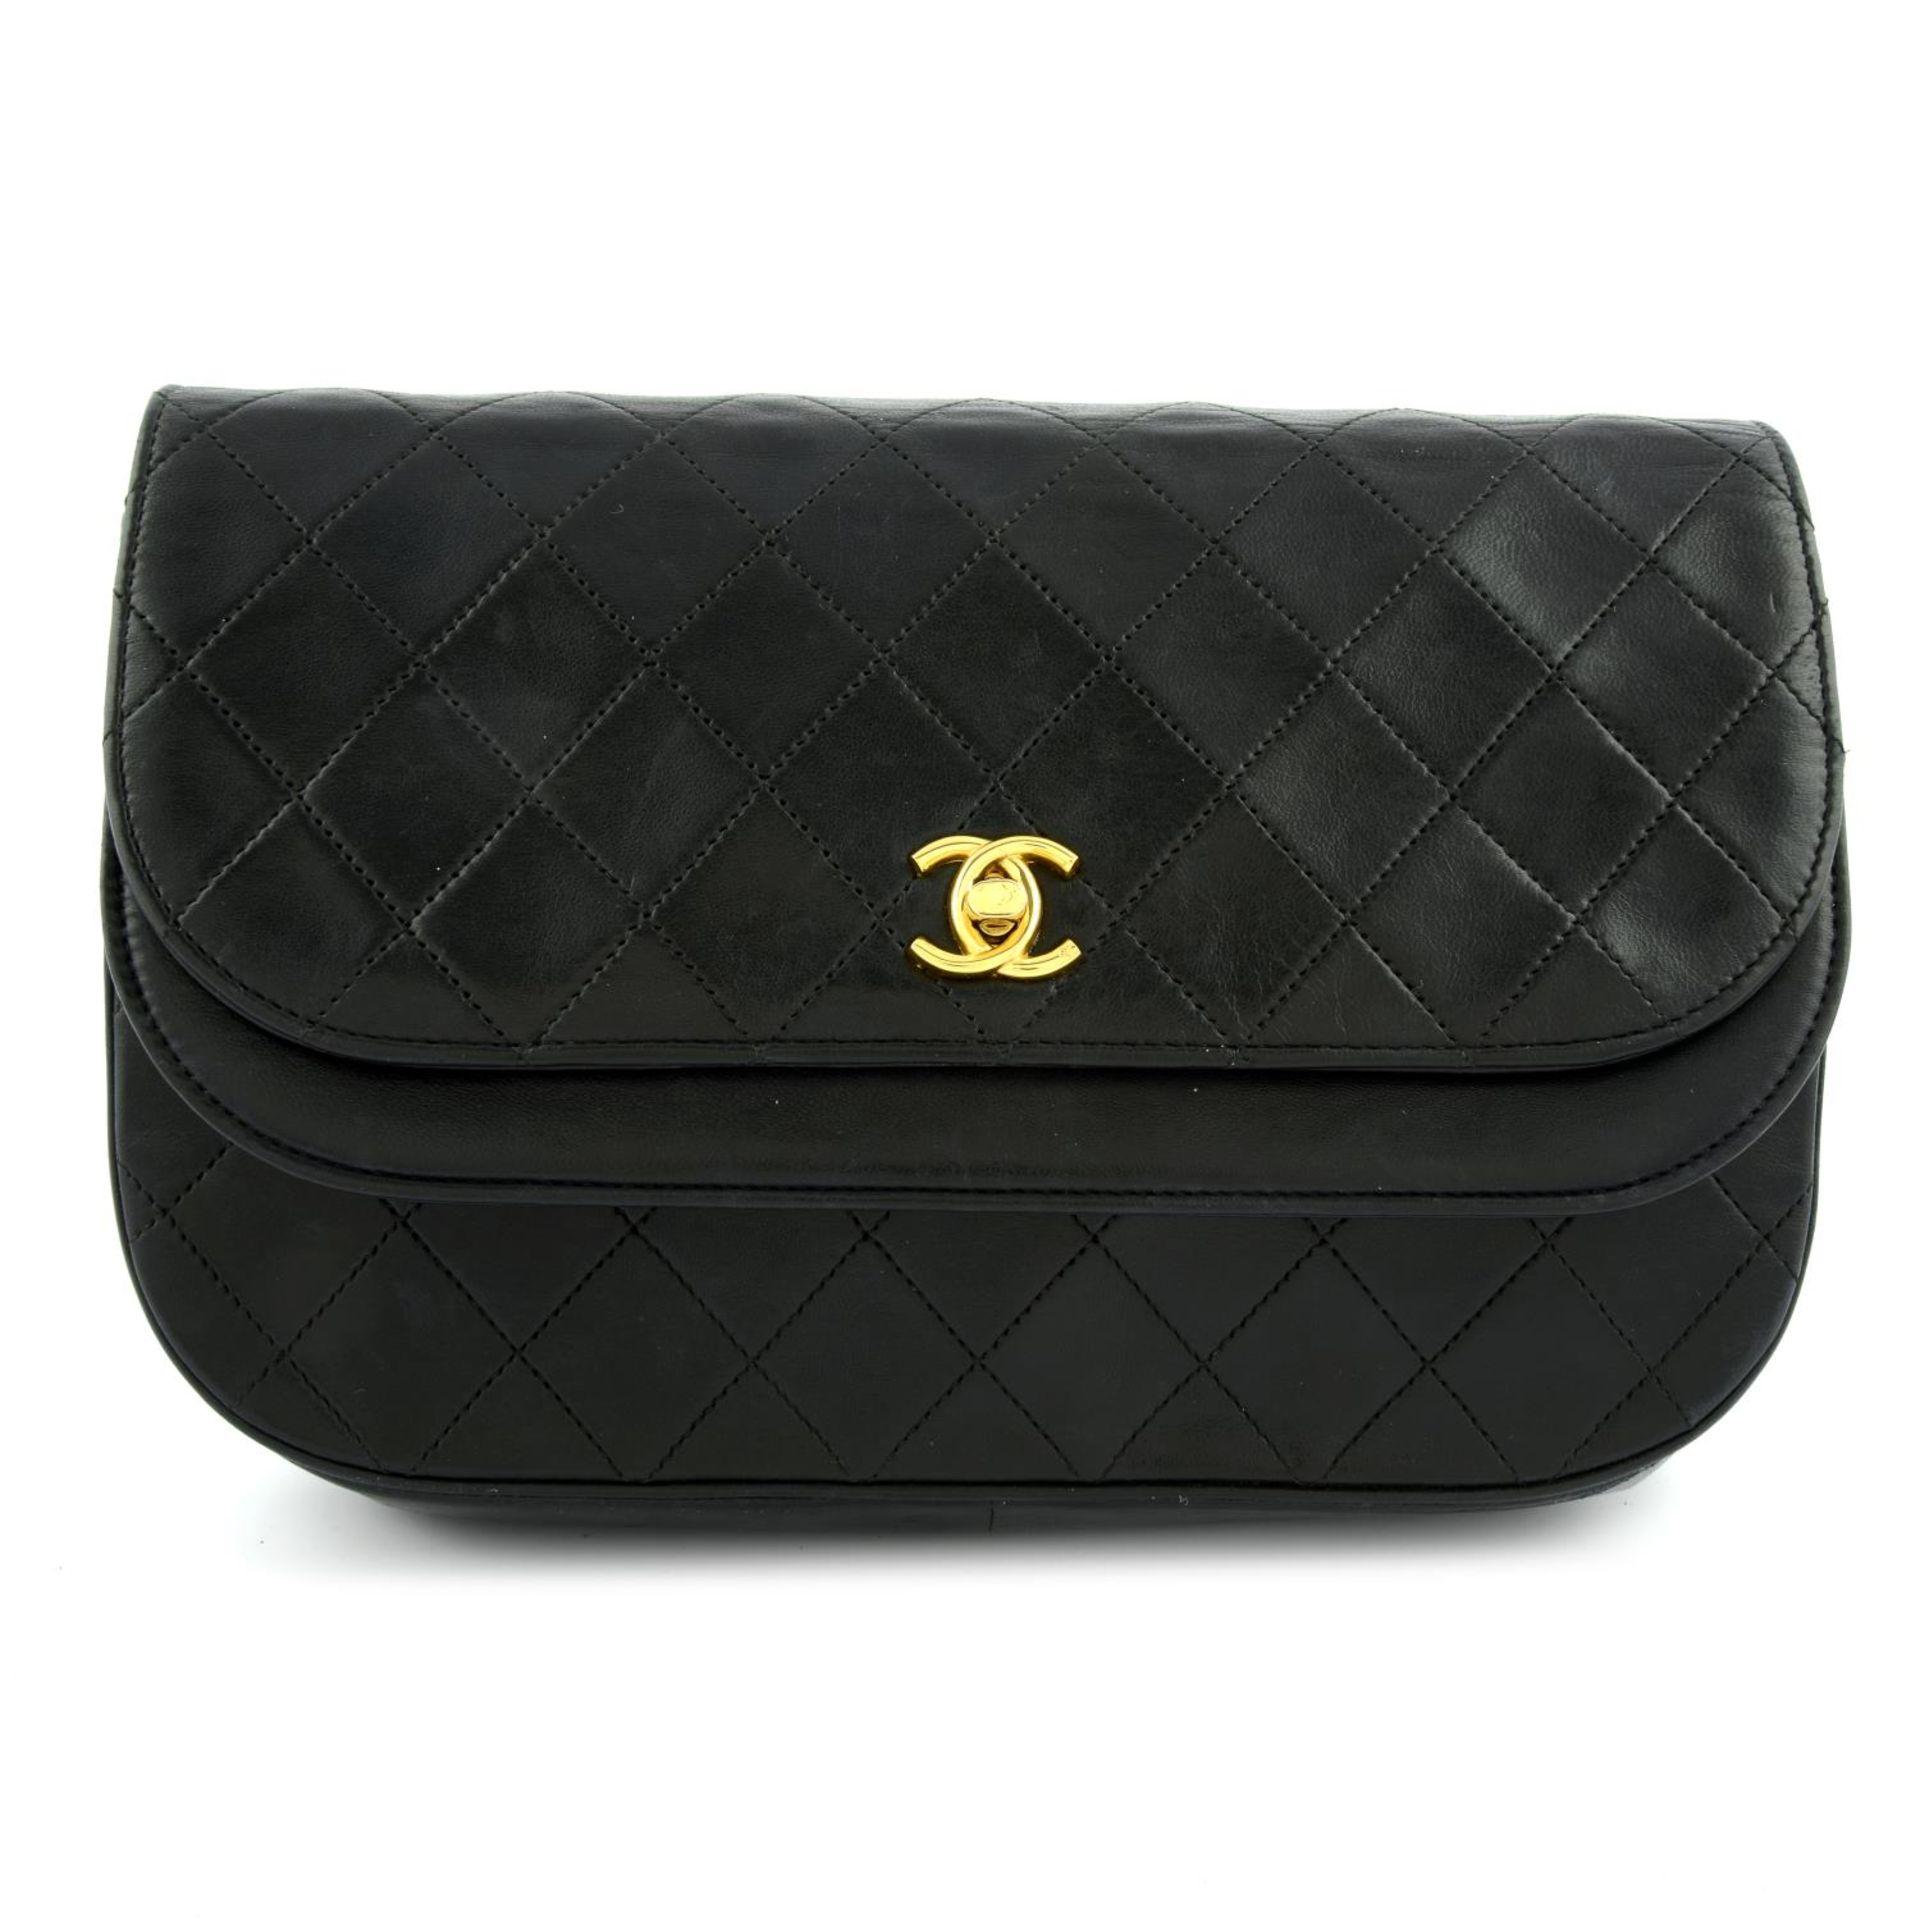 CHANEL - a leather double flap handbag.